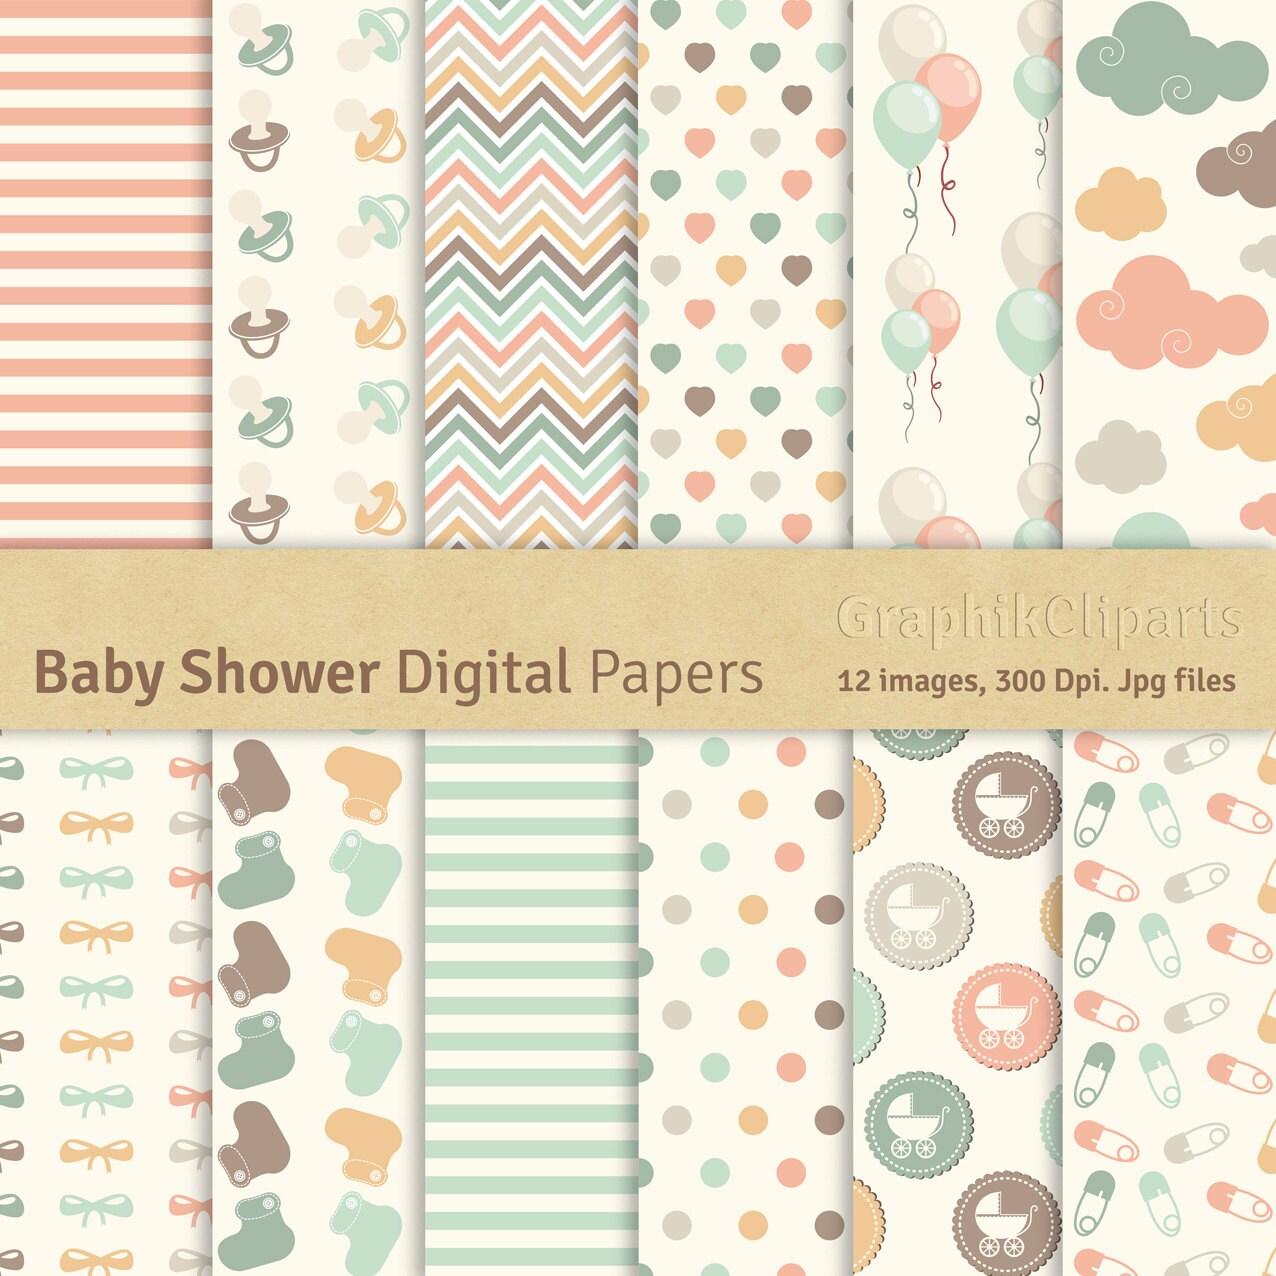 Scrapbook paper baby - Baby Shower Digital Papers Baby Shower Birthday Patterns Scrapbook Paper 12 Images 300 Dpi Jpg Files Instant Download